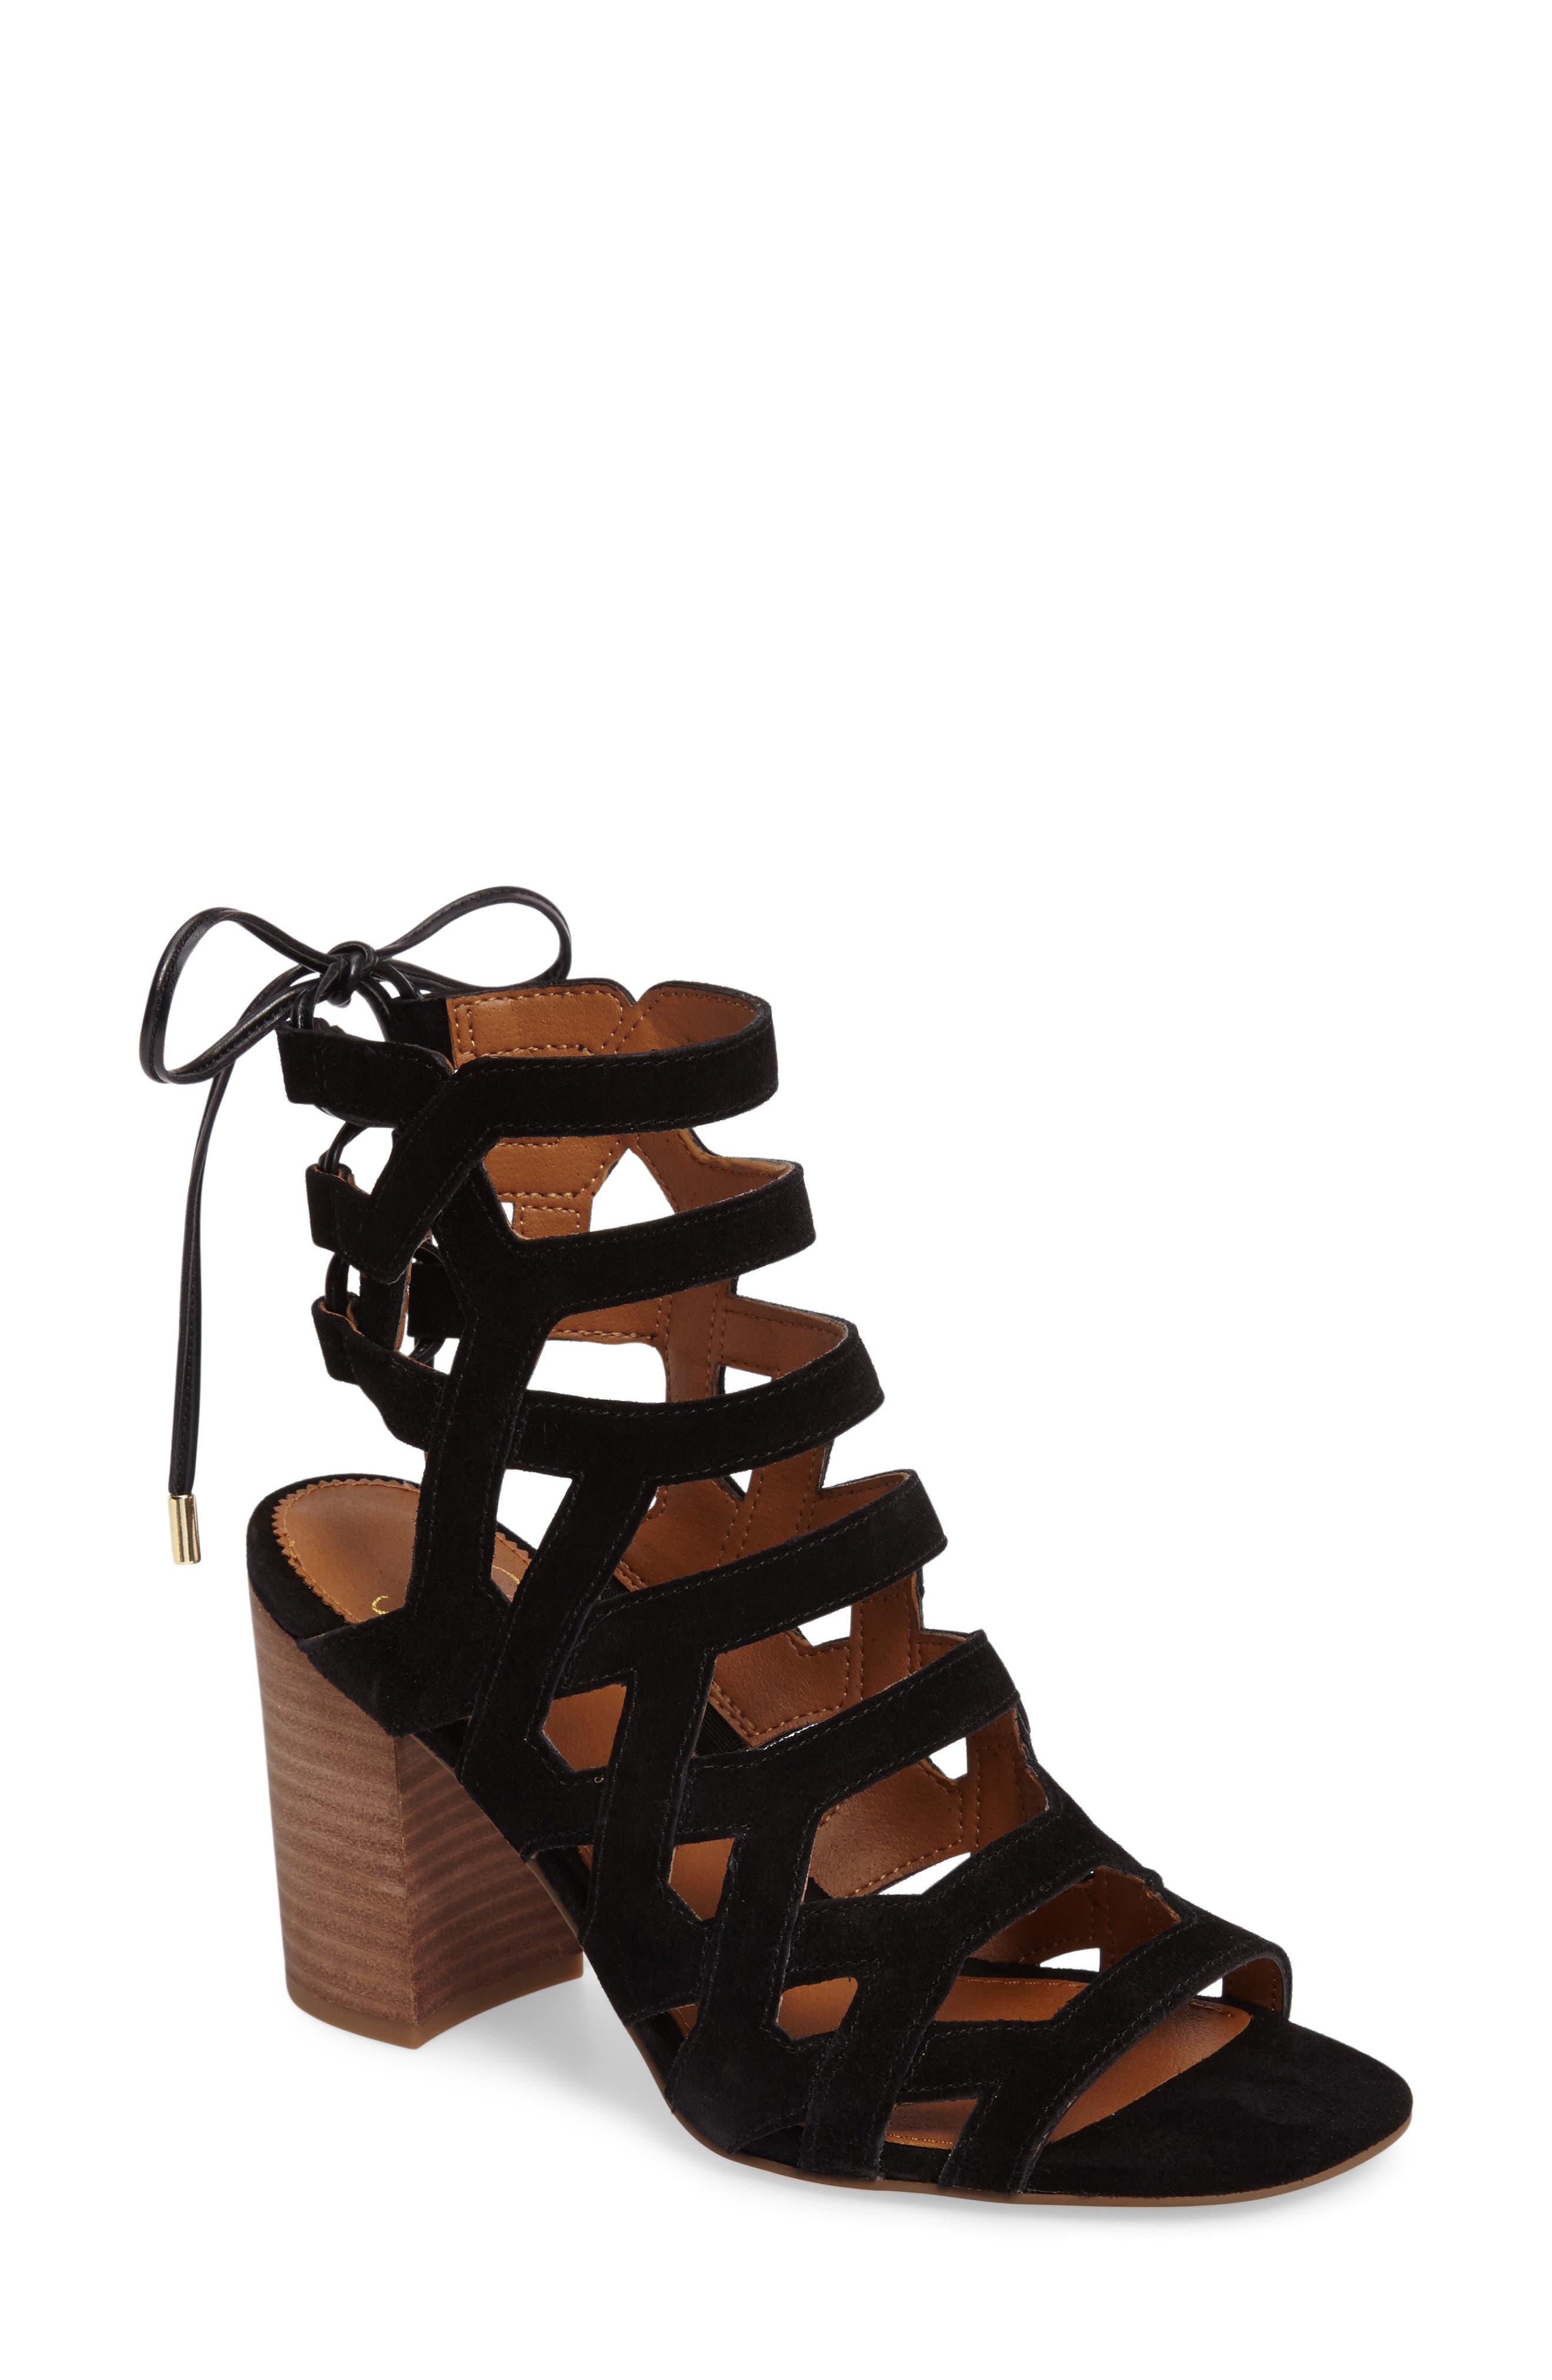 Alternate Image 1 Selected - SARTO by Franco Sarto Connie Block Heel Cage Sandal (Women)